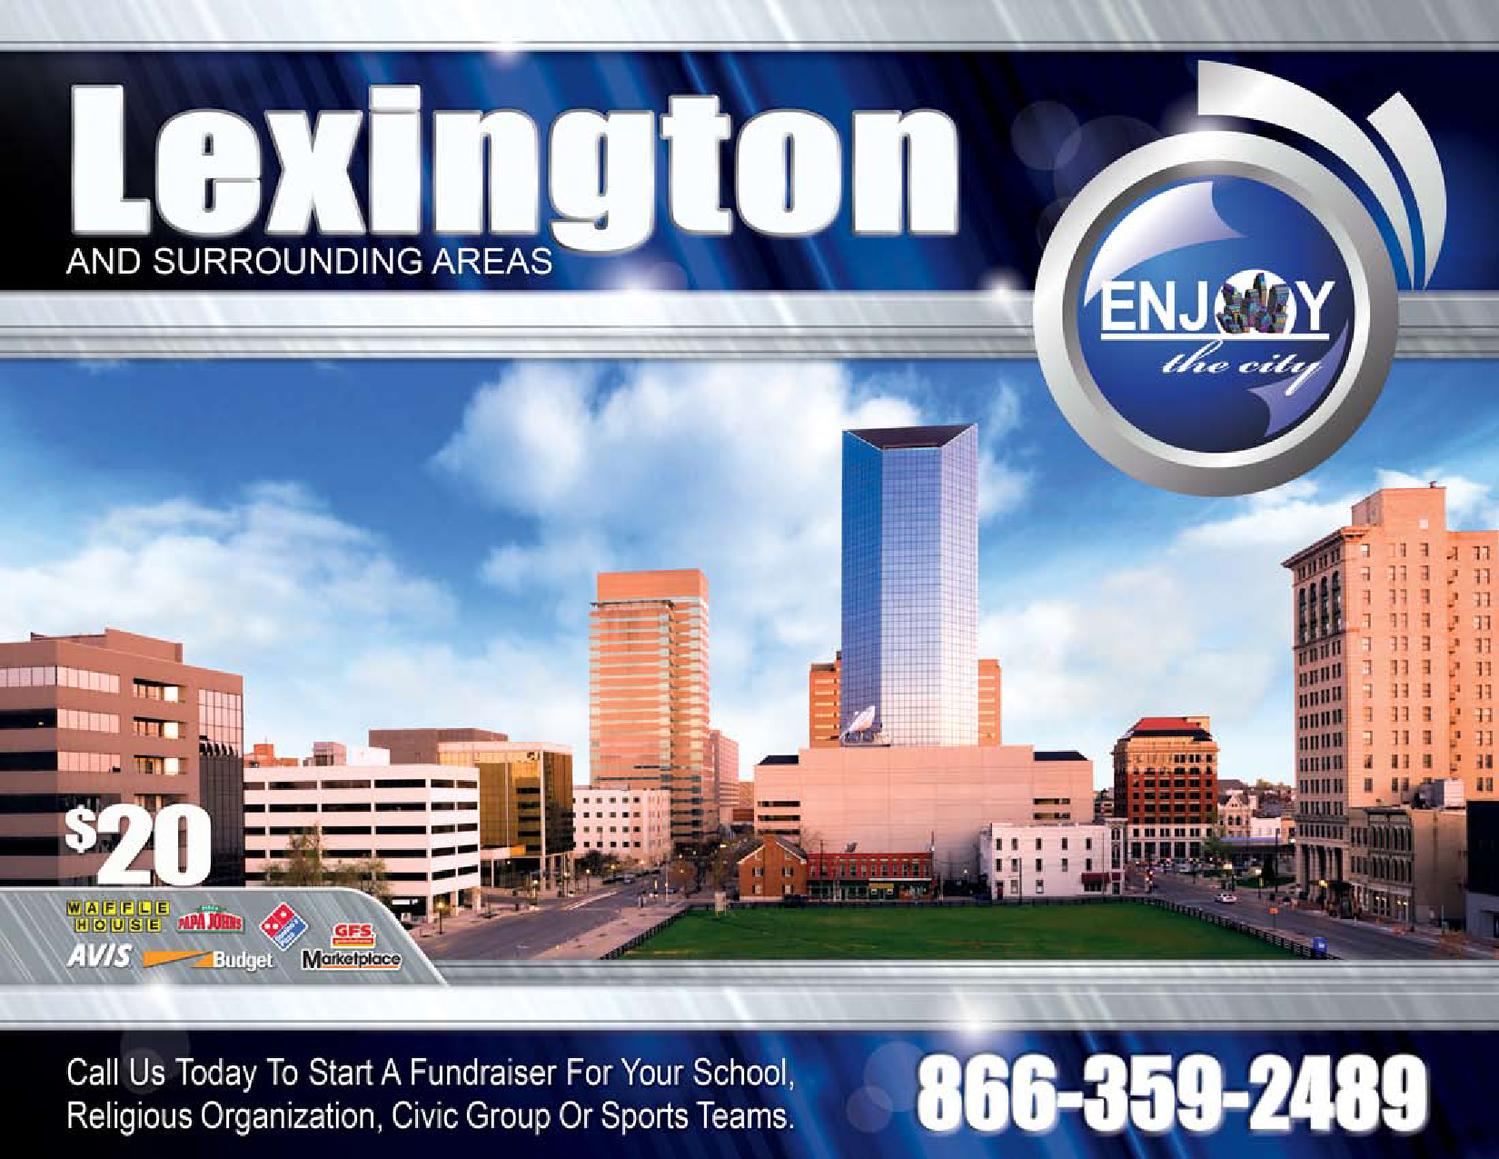 Lexington Fall 13 By Enjoy The City Inc Issuu